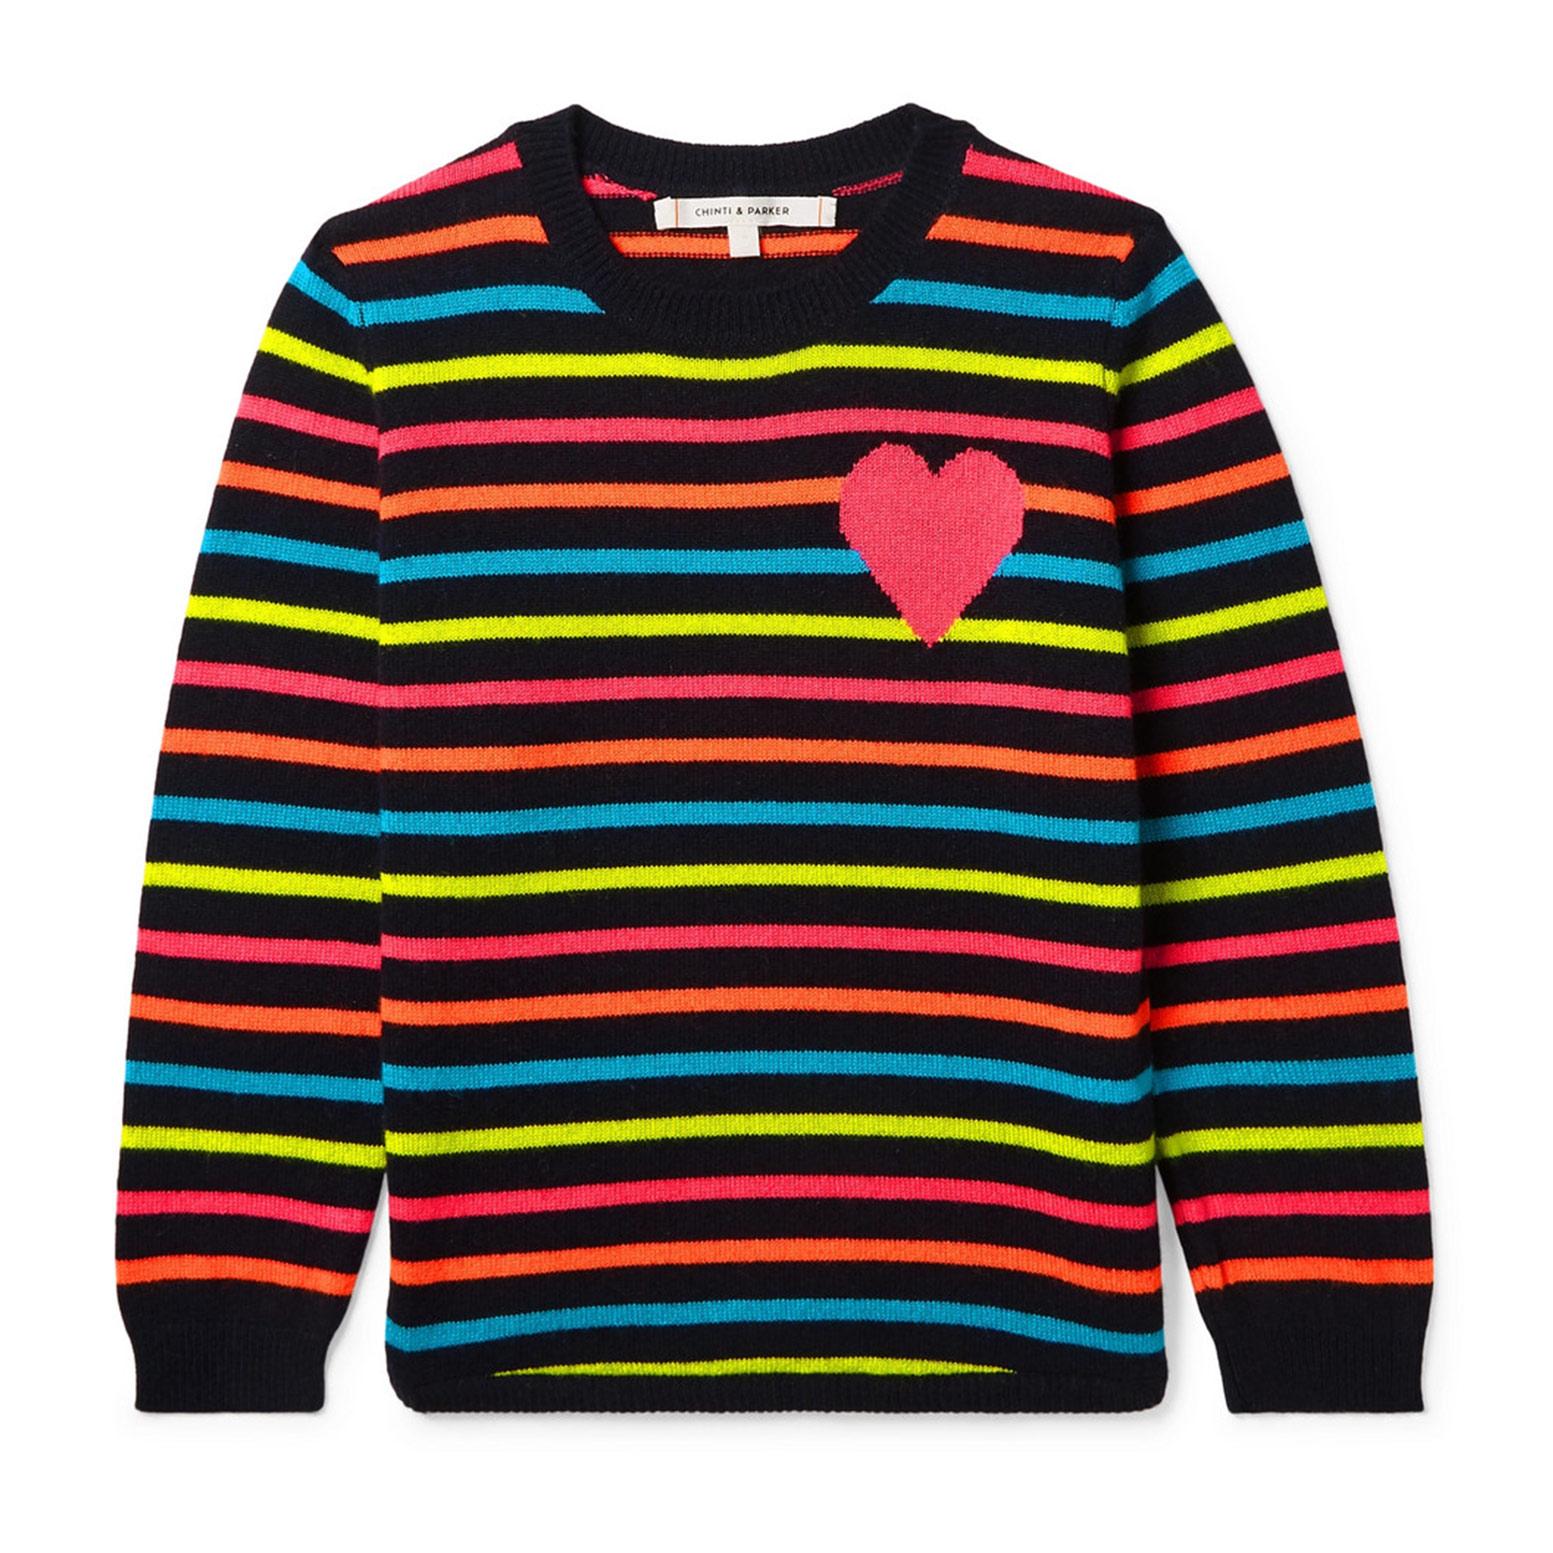 Chinti & Parker Kids Striped Cashmere Sweater